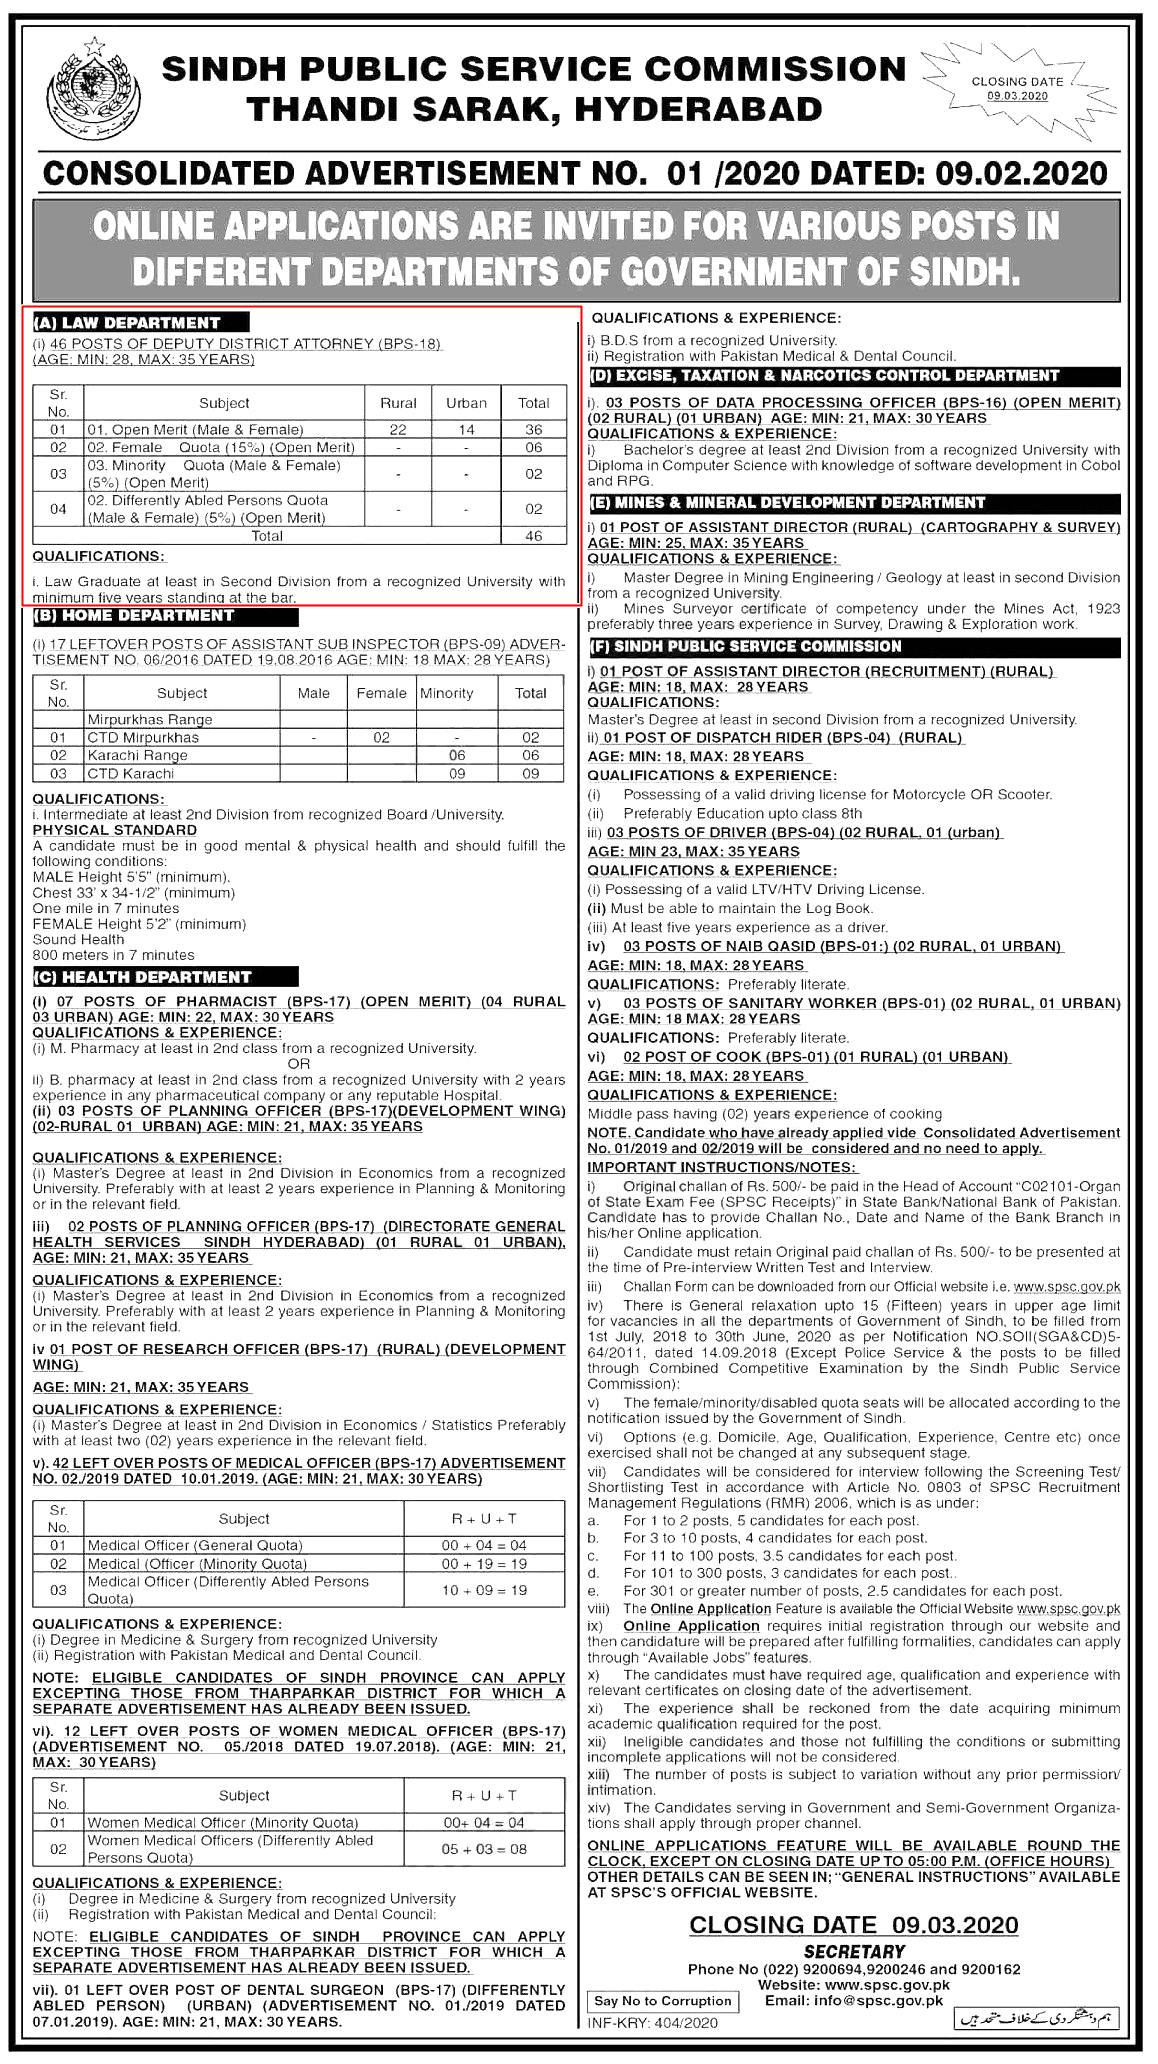 SPSC Sindh Law Department Deputy District Attorney Jobs February 2021 Online Registration Eligibility Criteria